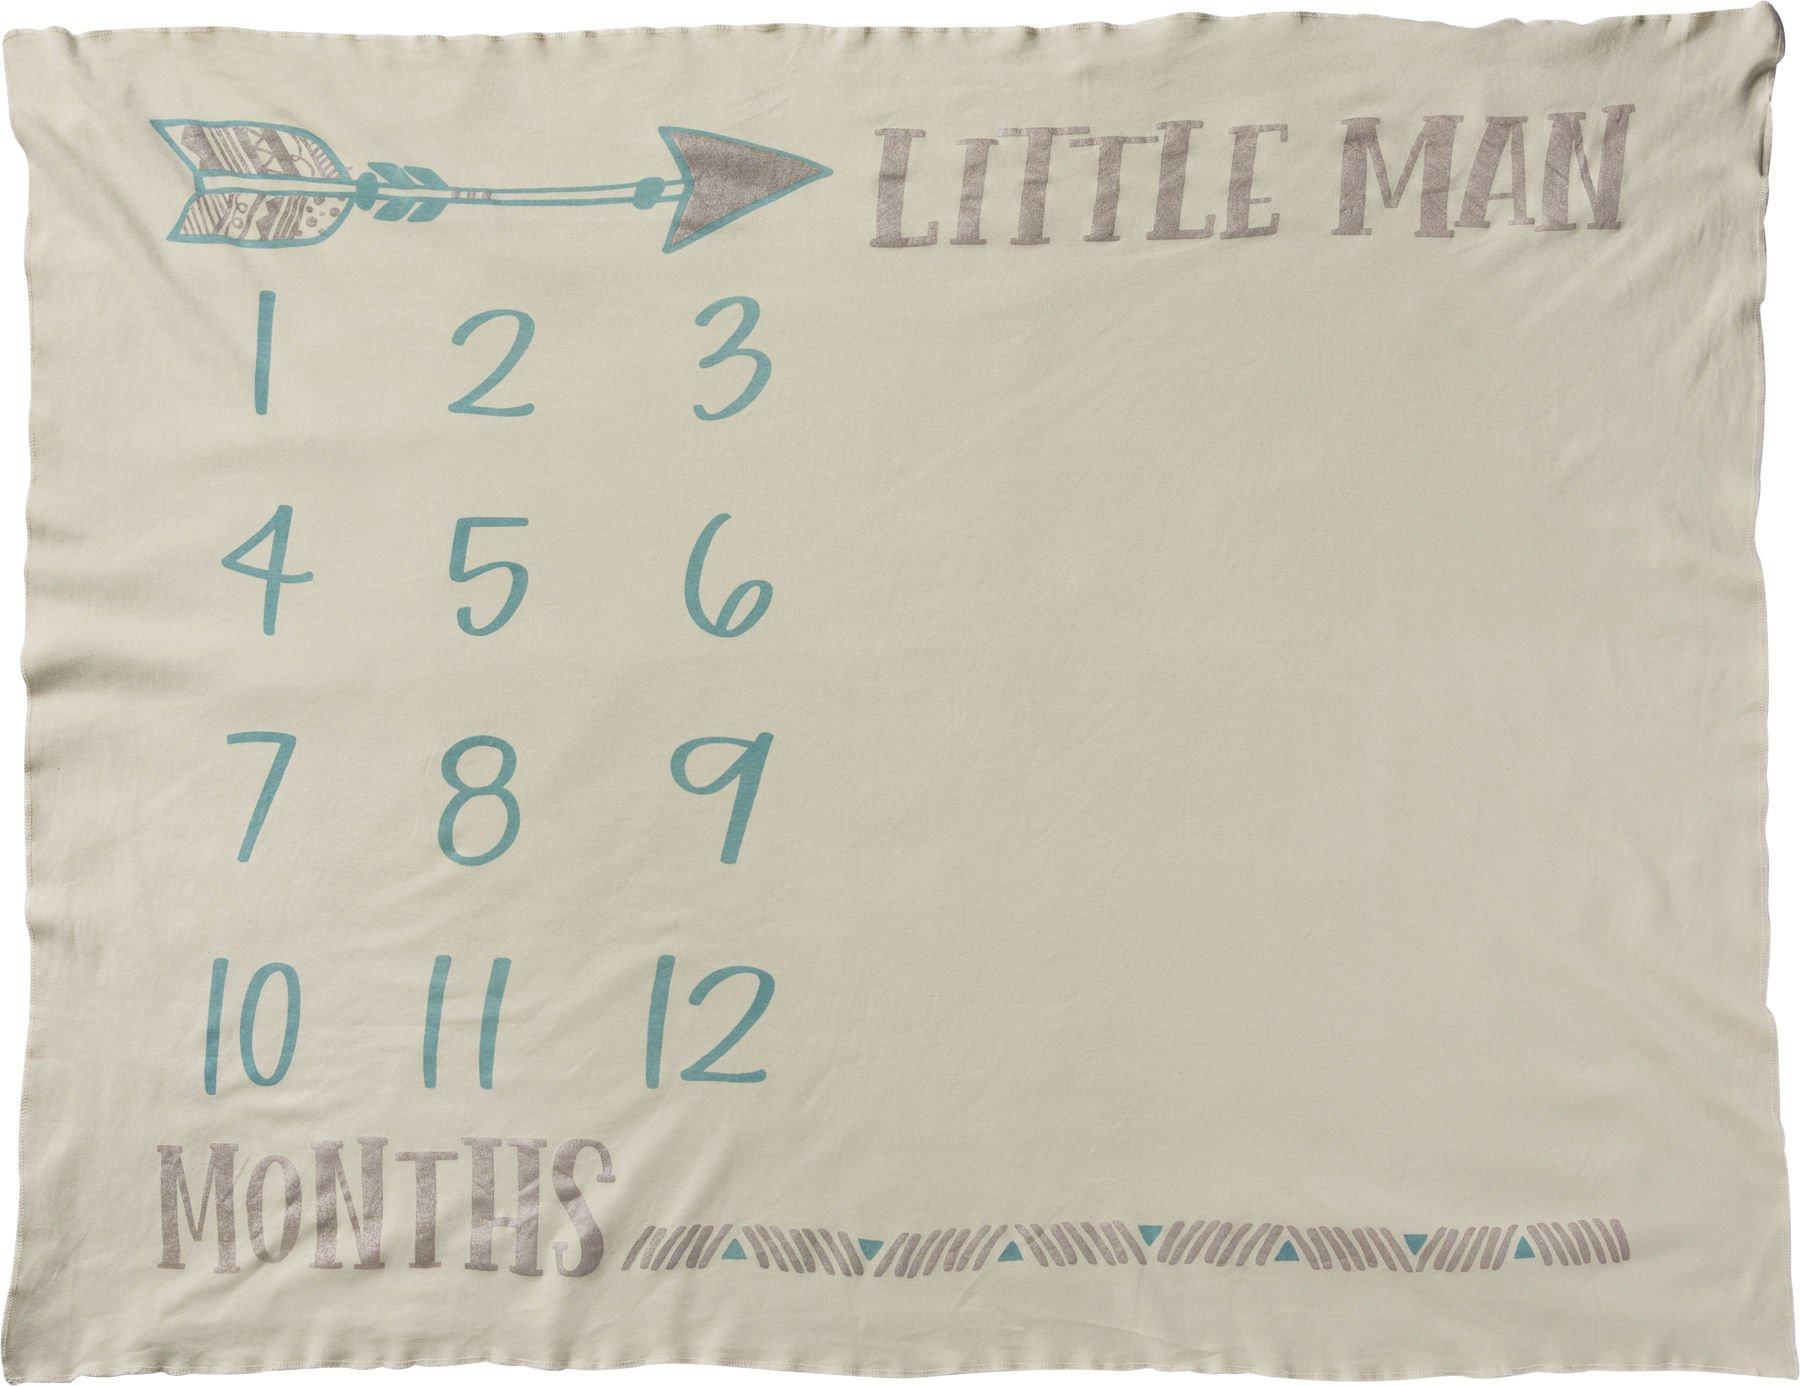 Primitives by Kathy Swaddle Blanket, Little Man Milestone Photo Prop Baby Boy Blanket, Soft Knit Pima Cotton, 42'' x 36'' by Primitives by Kathy